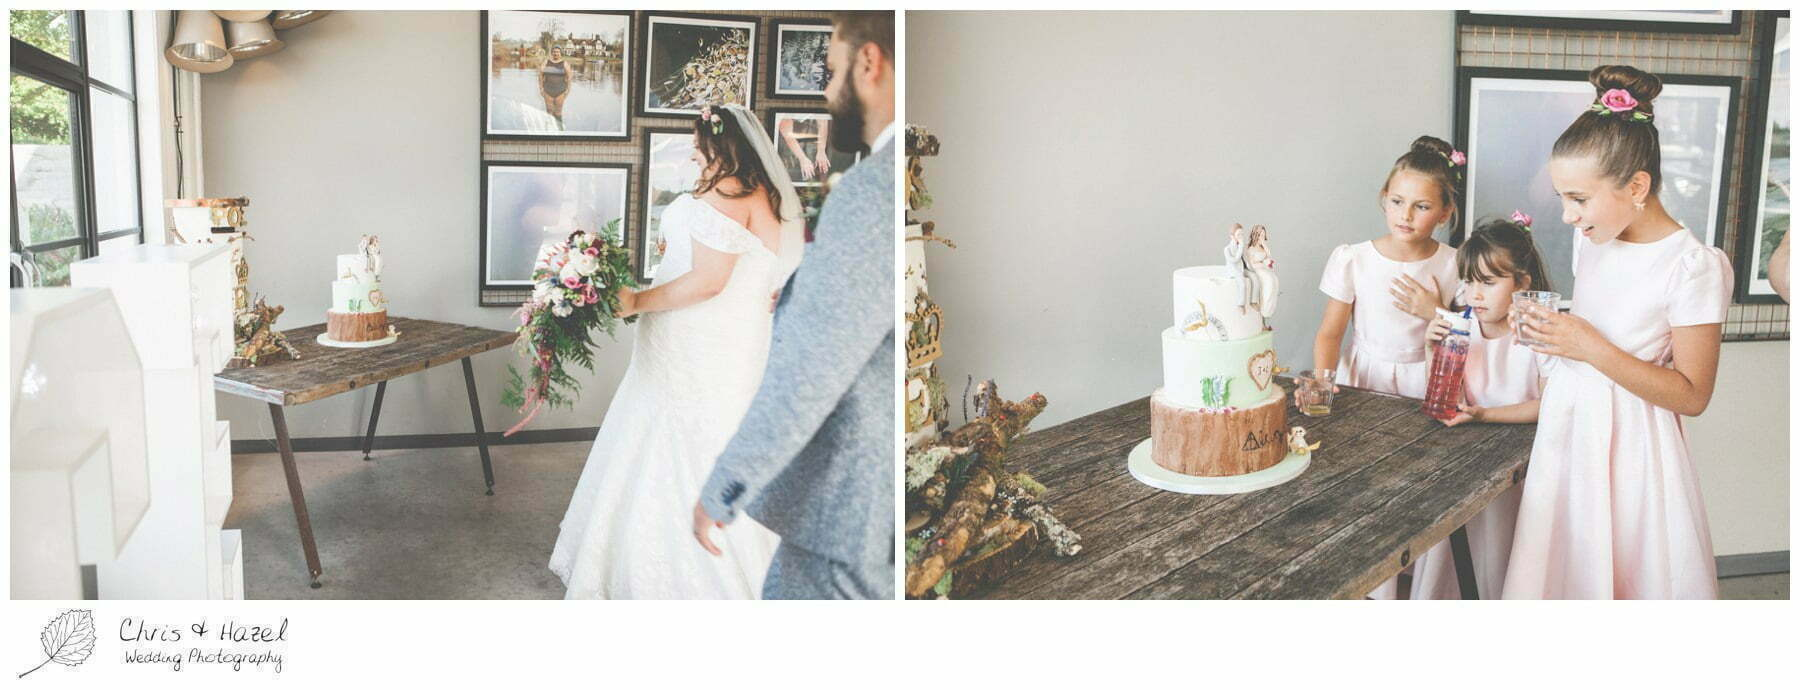 Wedding Cake, Woodland inspired, The Glove Factory Wedding Photography, Wiltshire Wedding Photographer Trowbridge, Chris and Hazel Wedding Photography